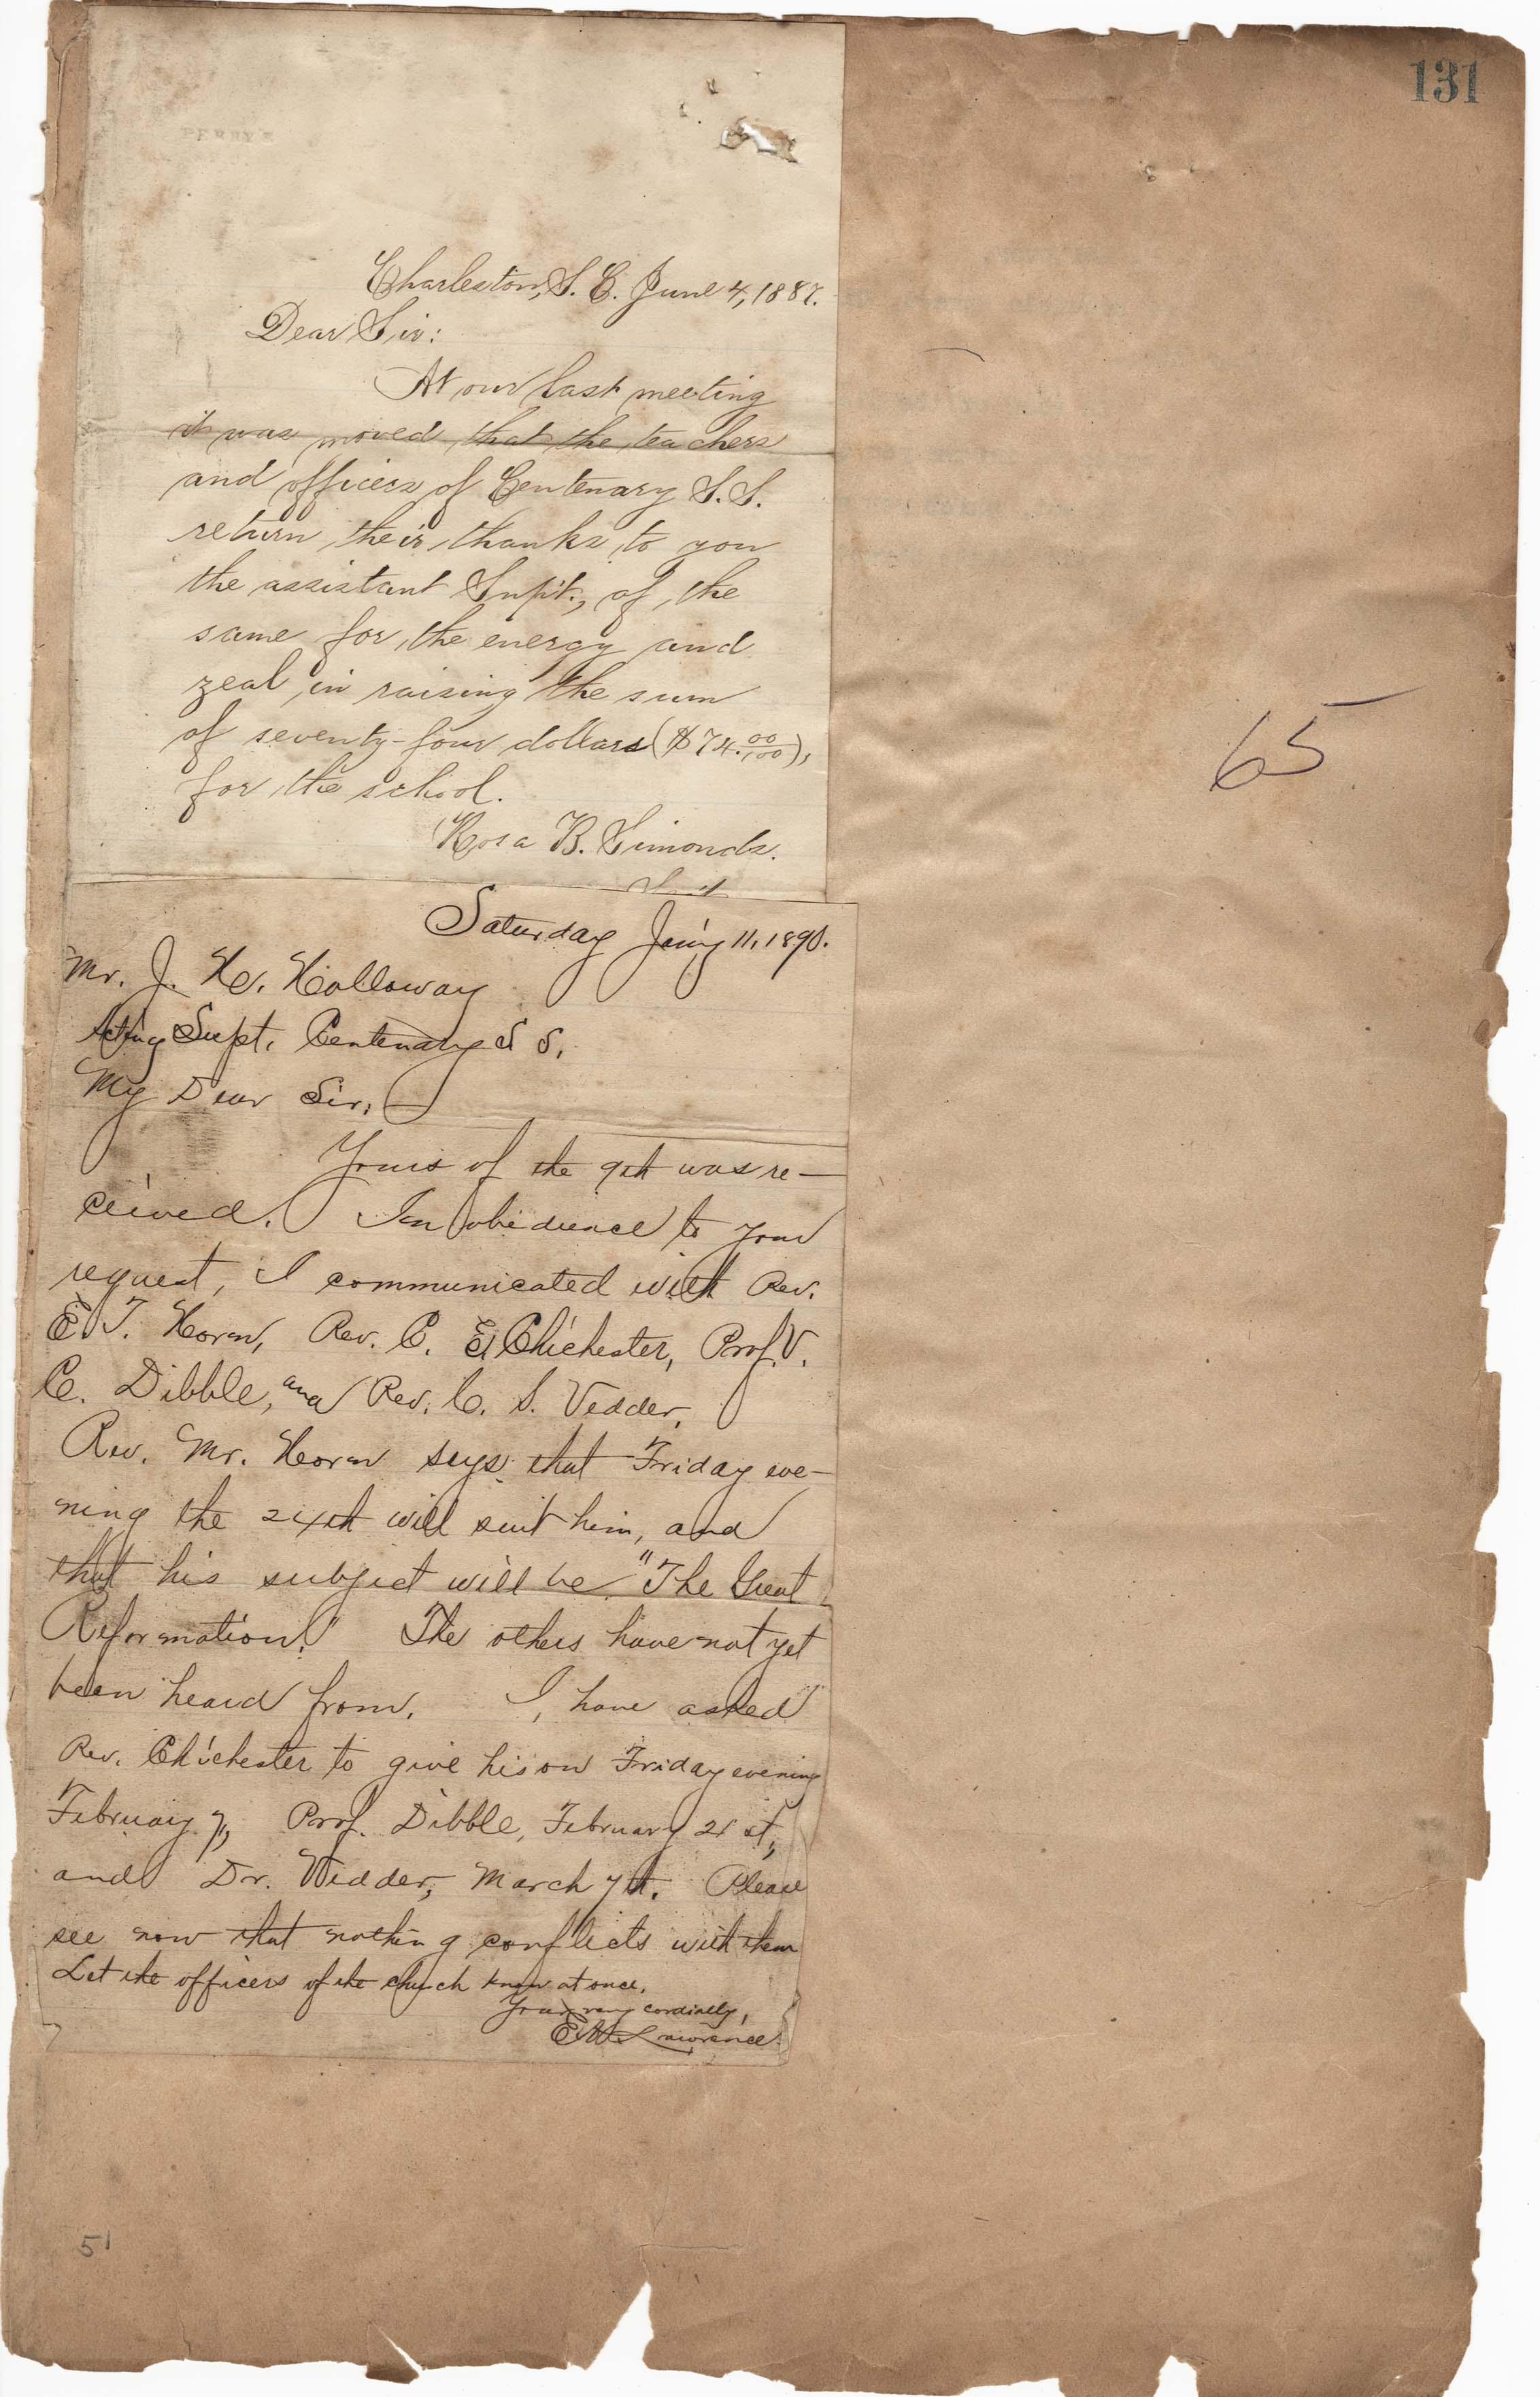 Rosa Simonds, Centenary Sunday School letters to James H. Holloway